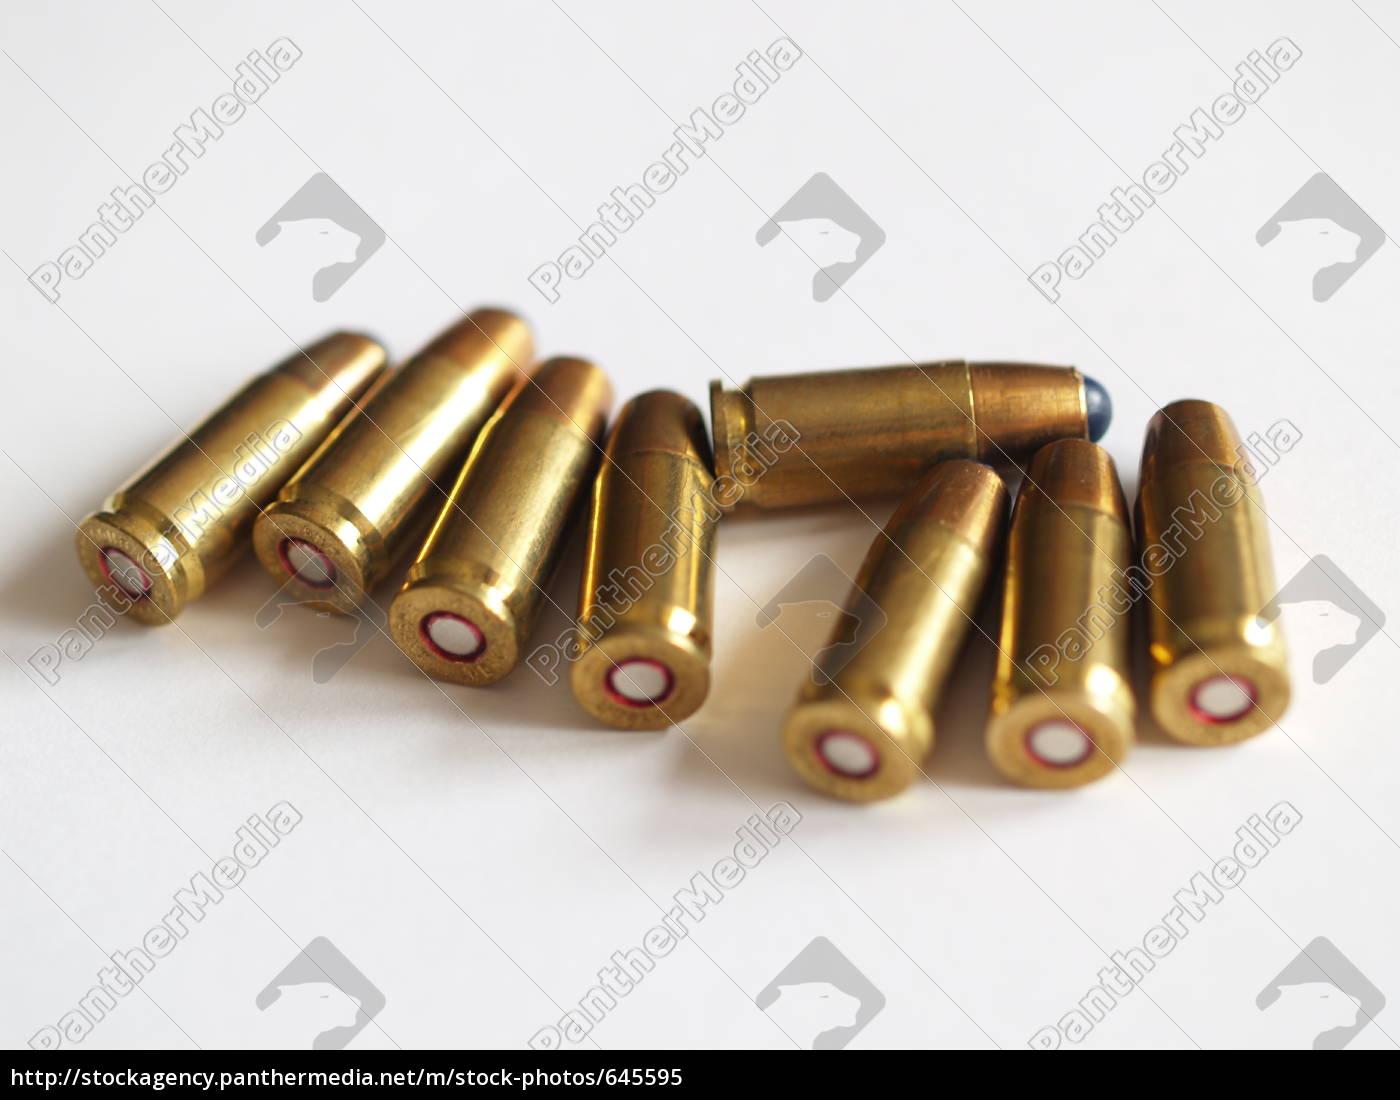 ammunition - 645595